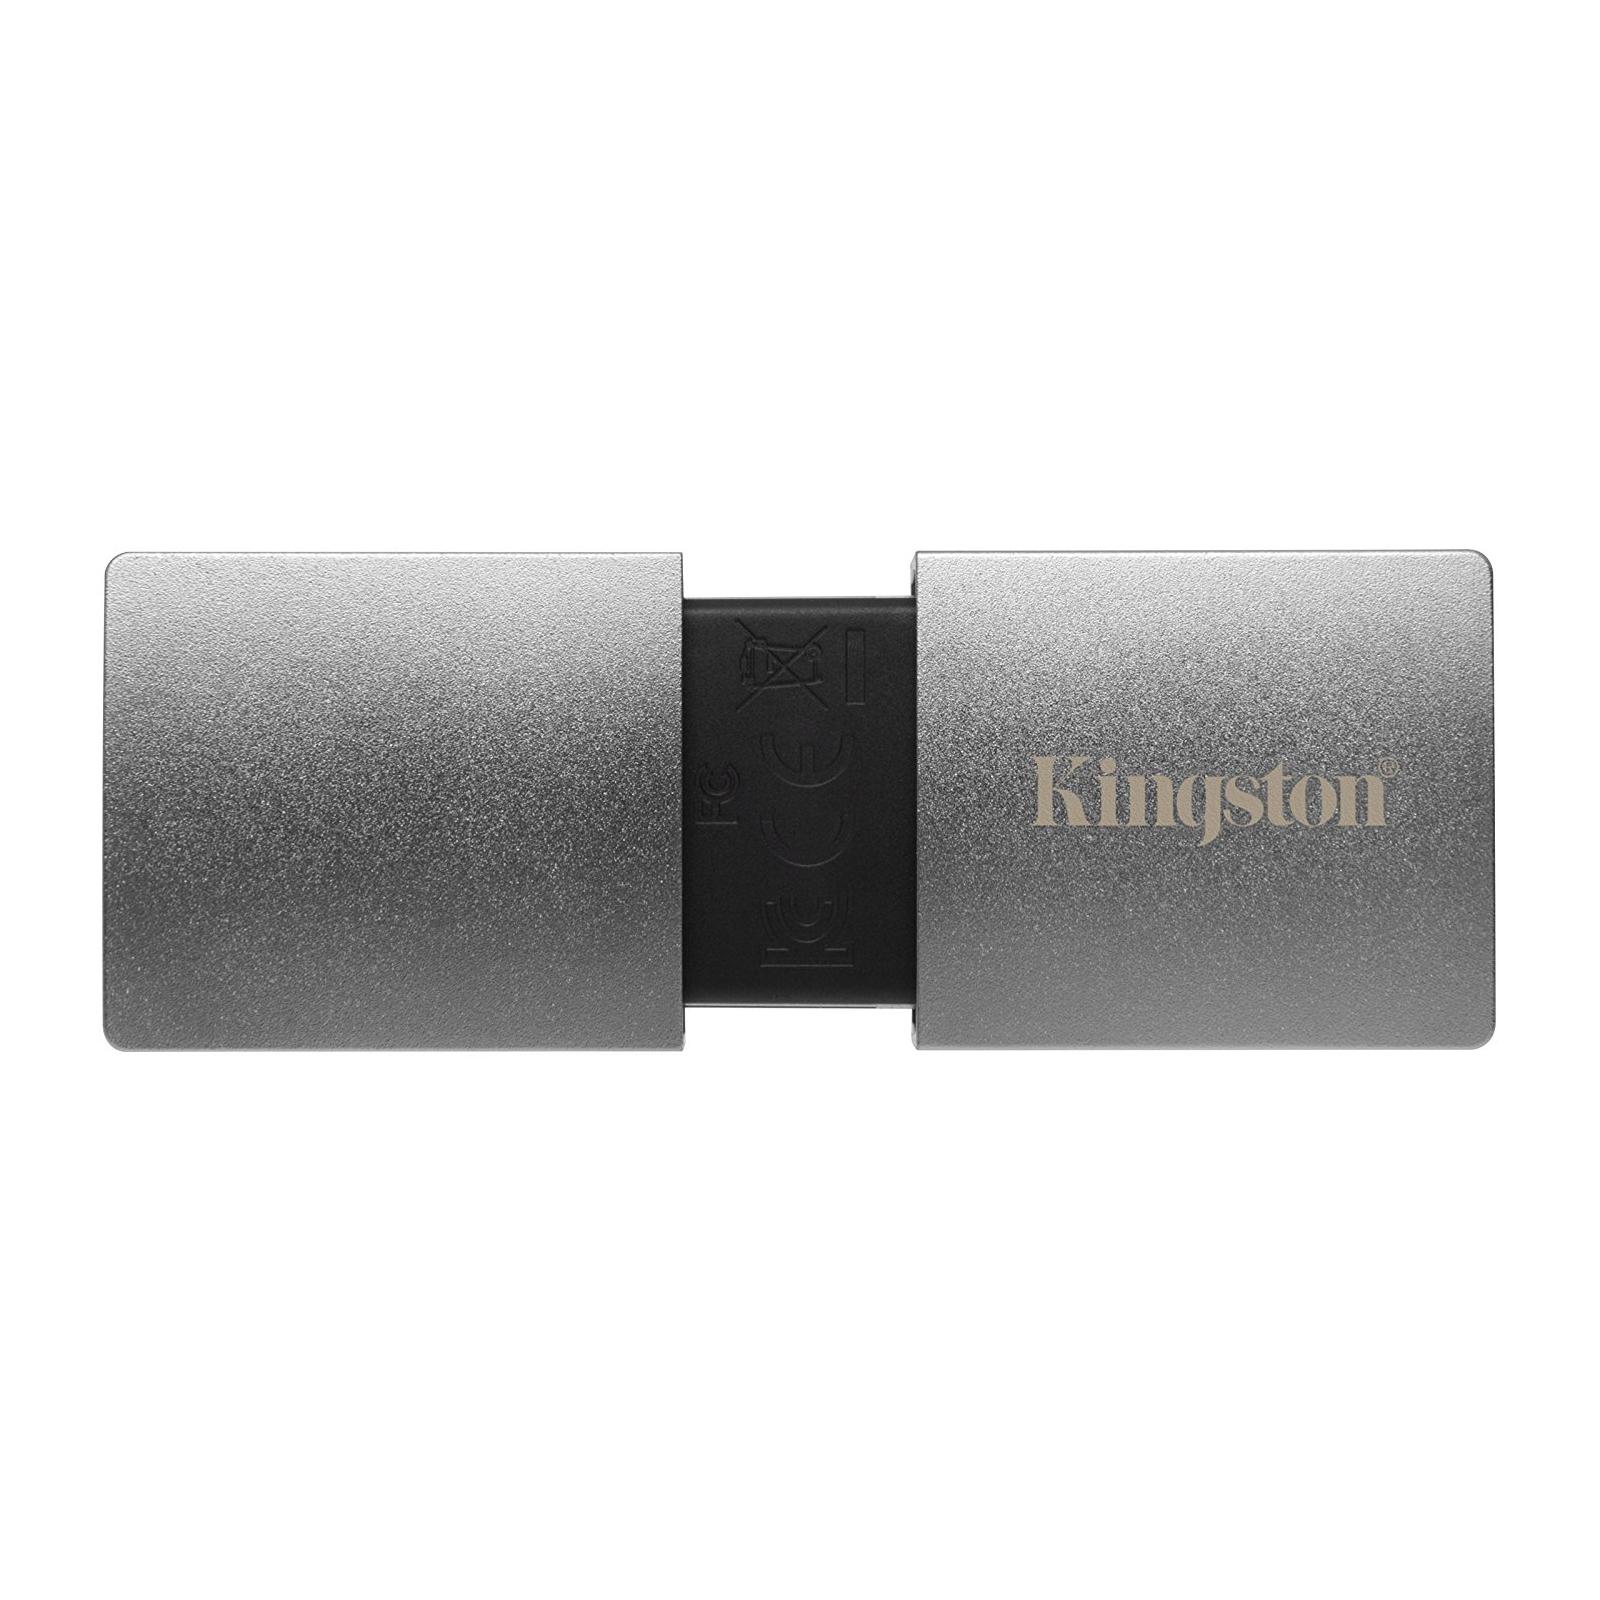 USB флеш накопитель Kingston 2TB DataTraveler Ultimate GT Metal Silver USB 3.1 (DTUGT/2TB) изображение 2